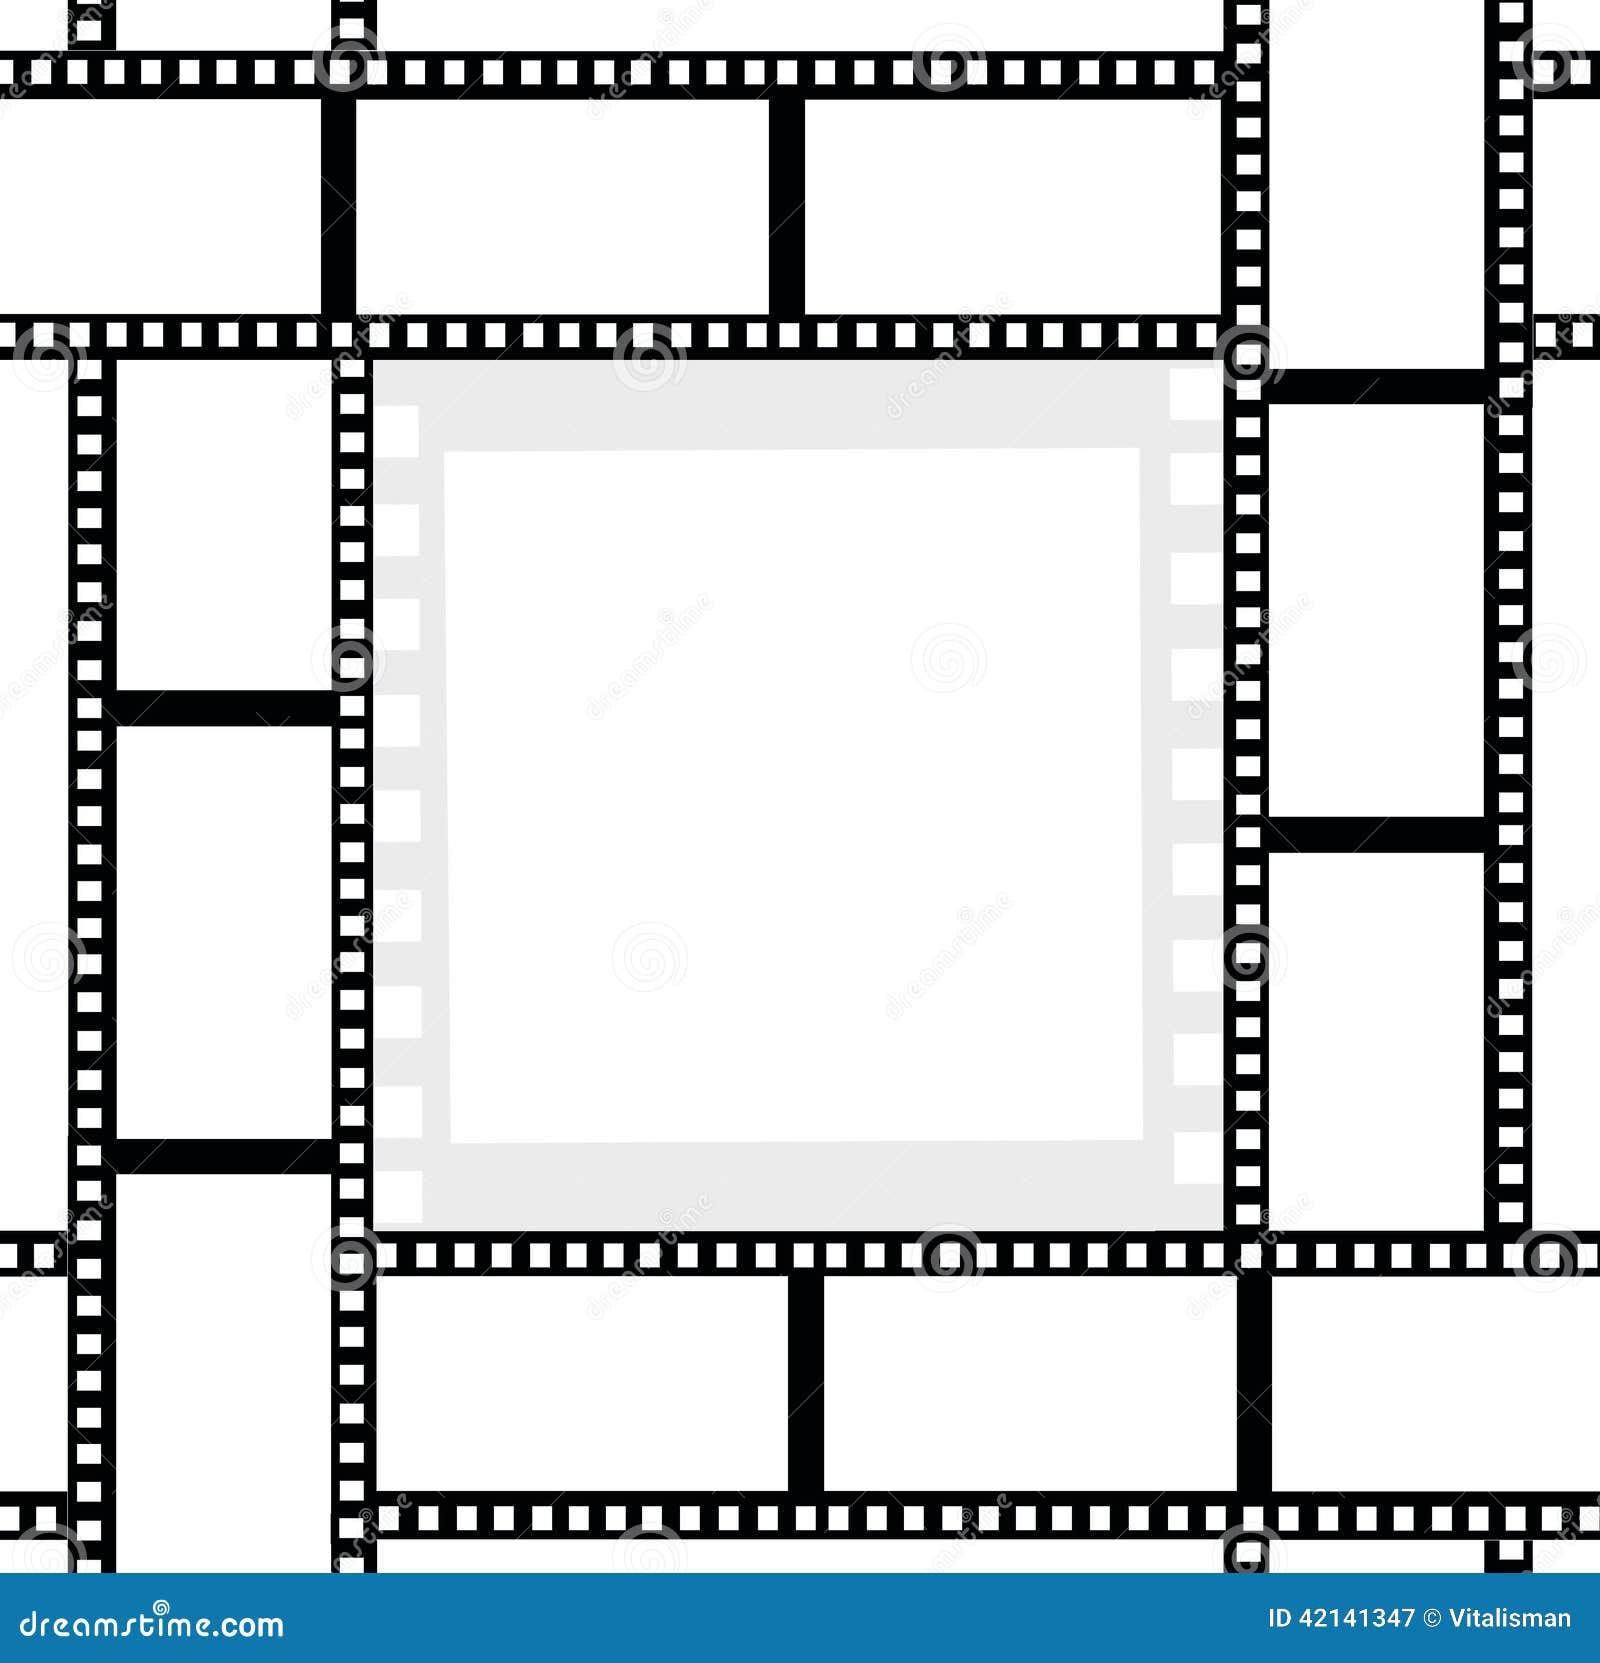 рамки для фото кино